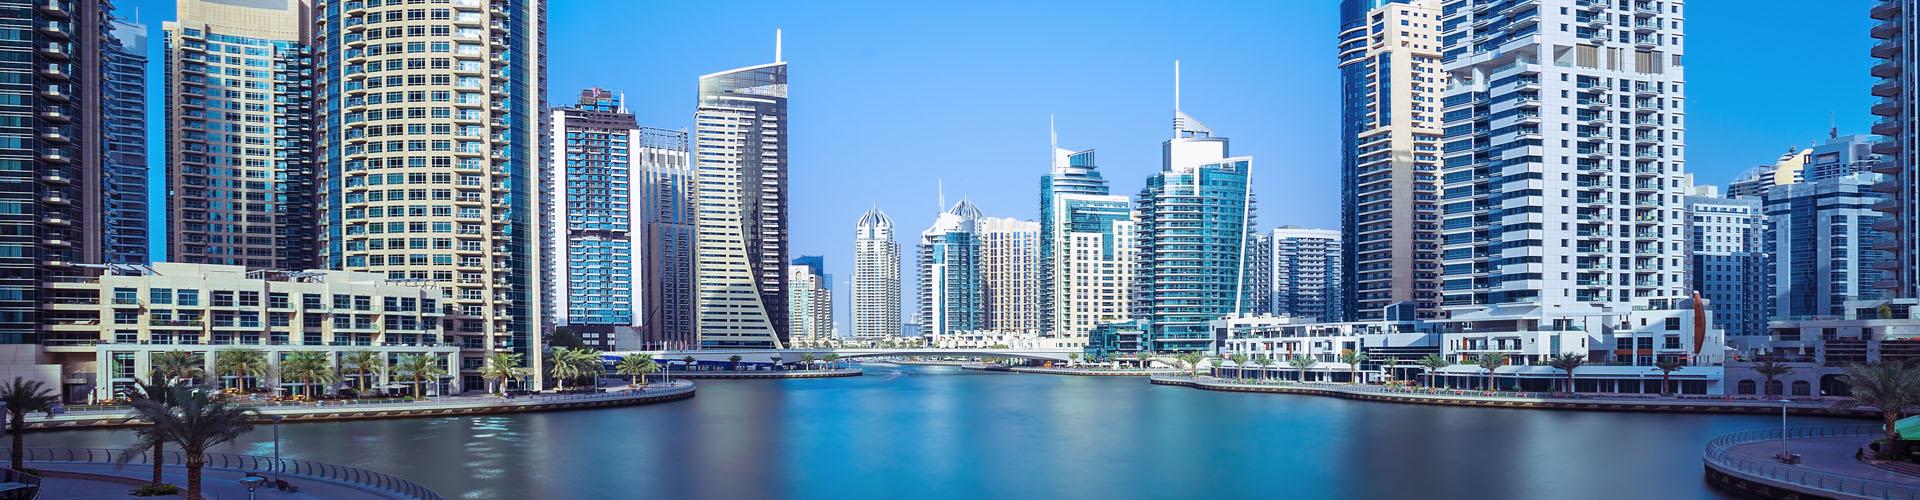 Investing in Dubai - Blue Water Real Estate